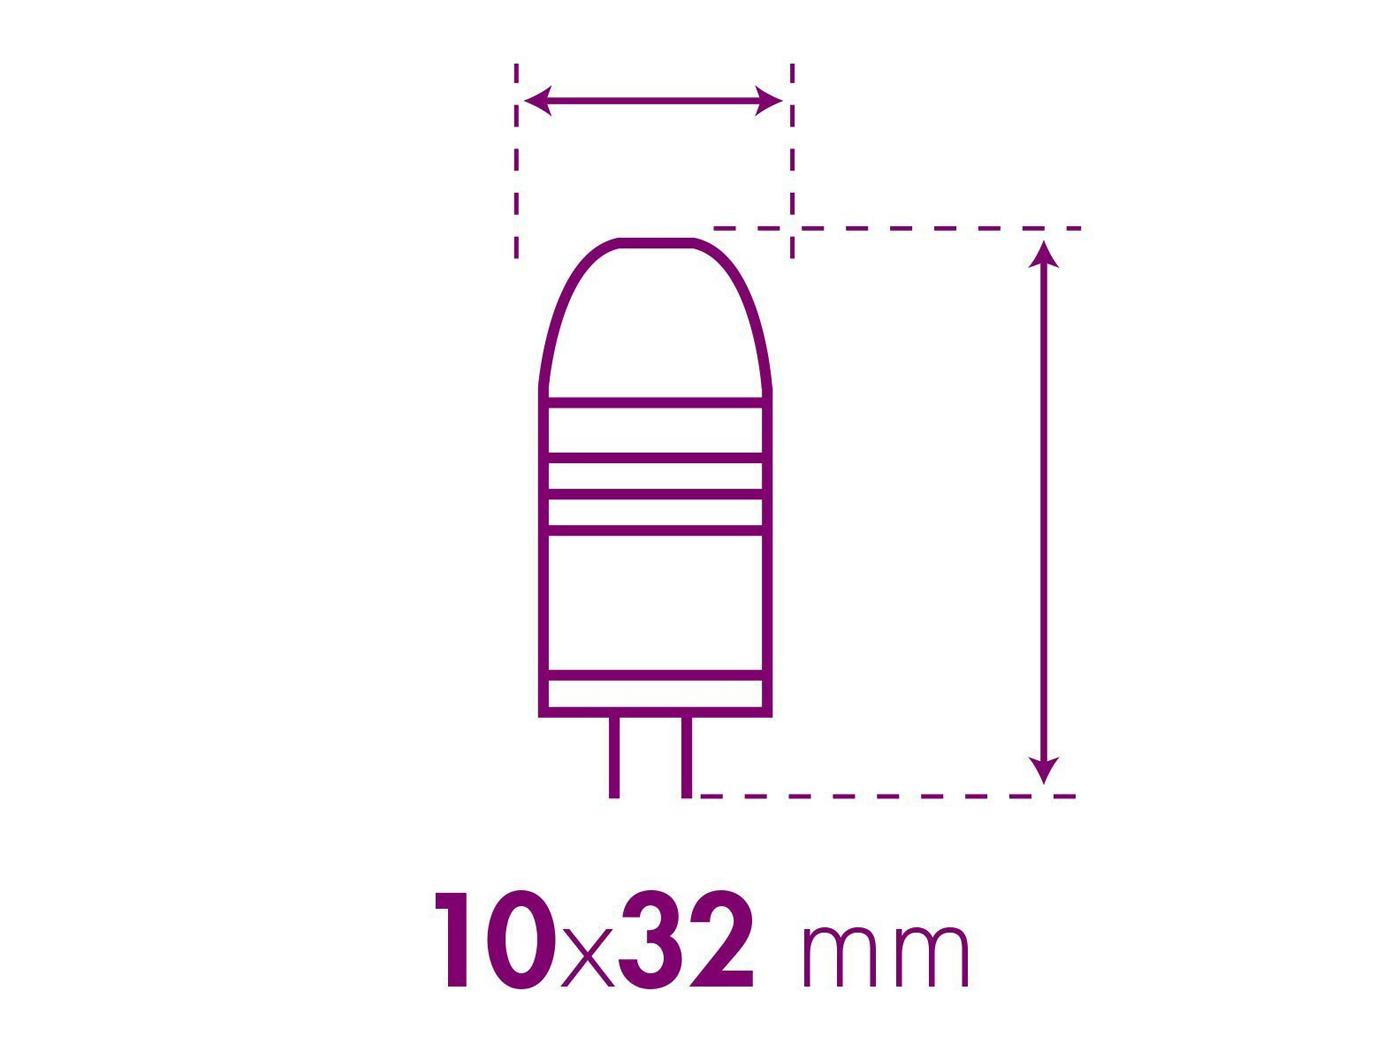 niedervolt smd led leuchtmittel 1 2 watt warmwei g4 12v xq lite ebay. Black Bedroom Furniture Sets. Home Design Ideas